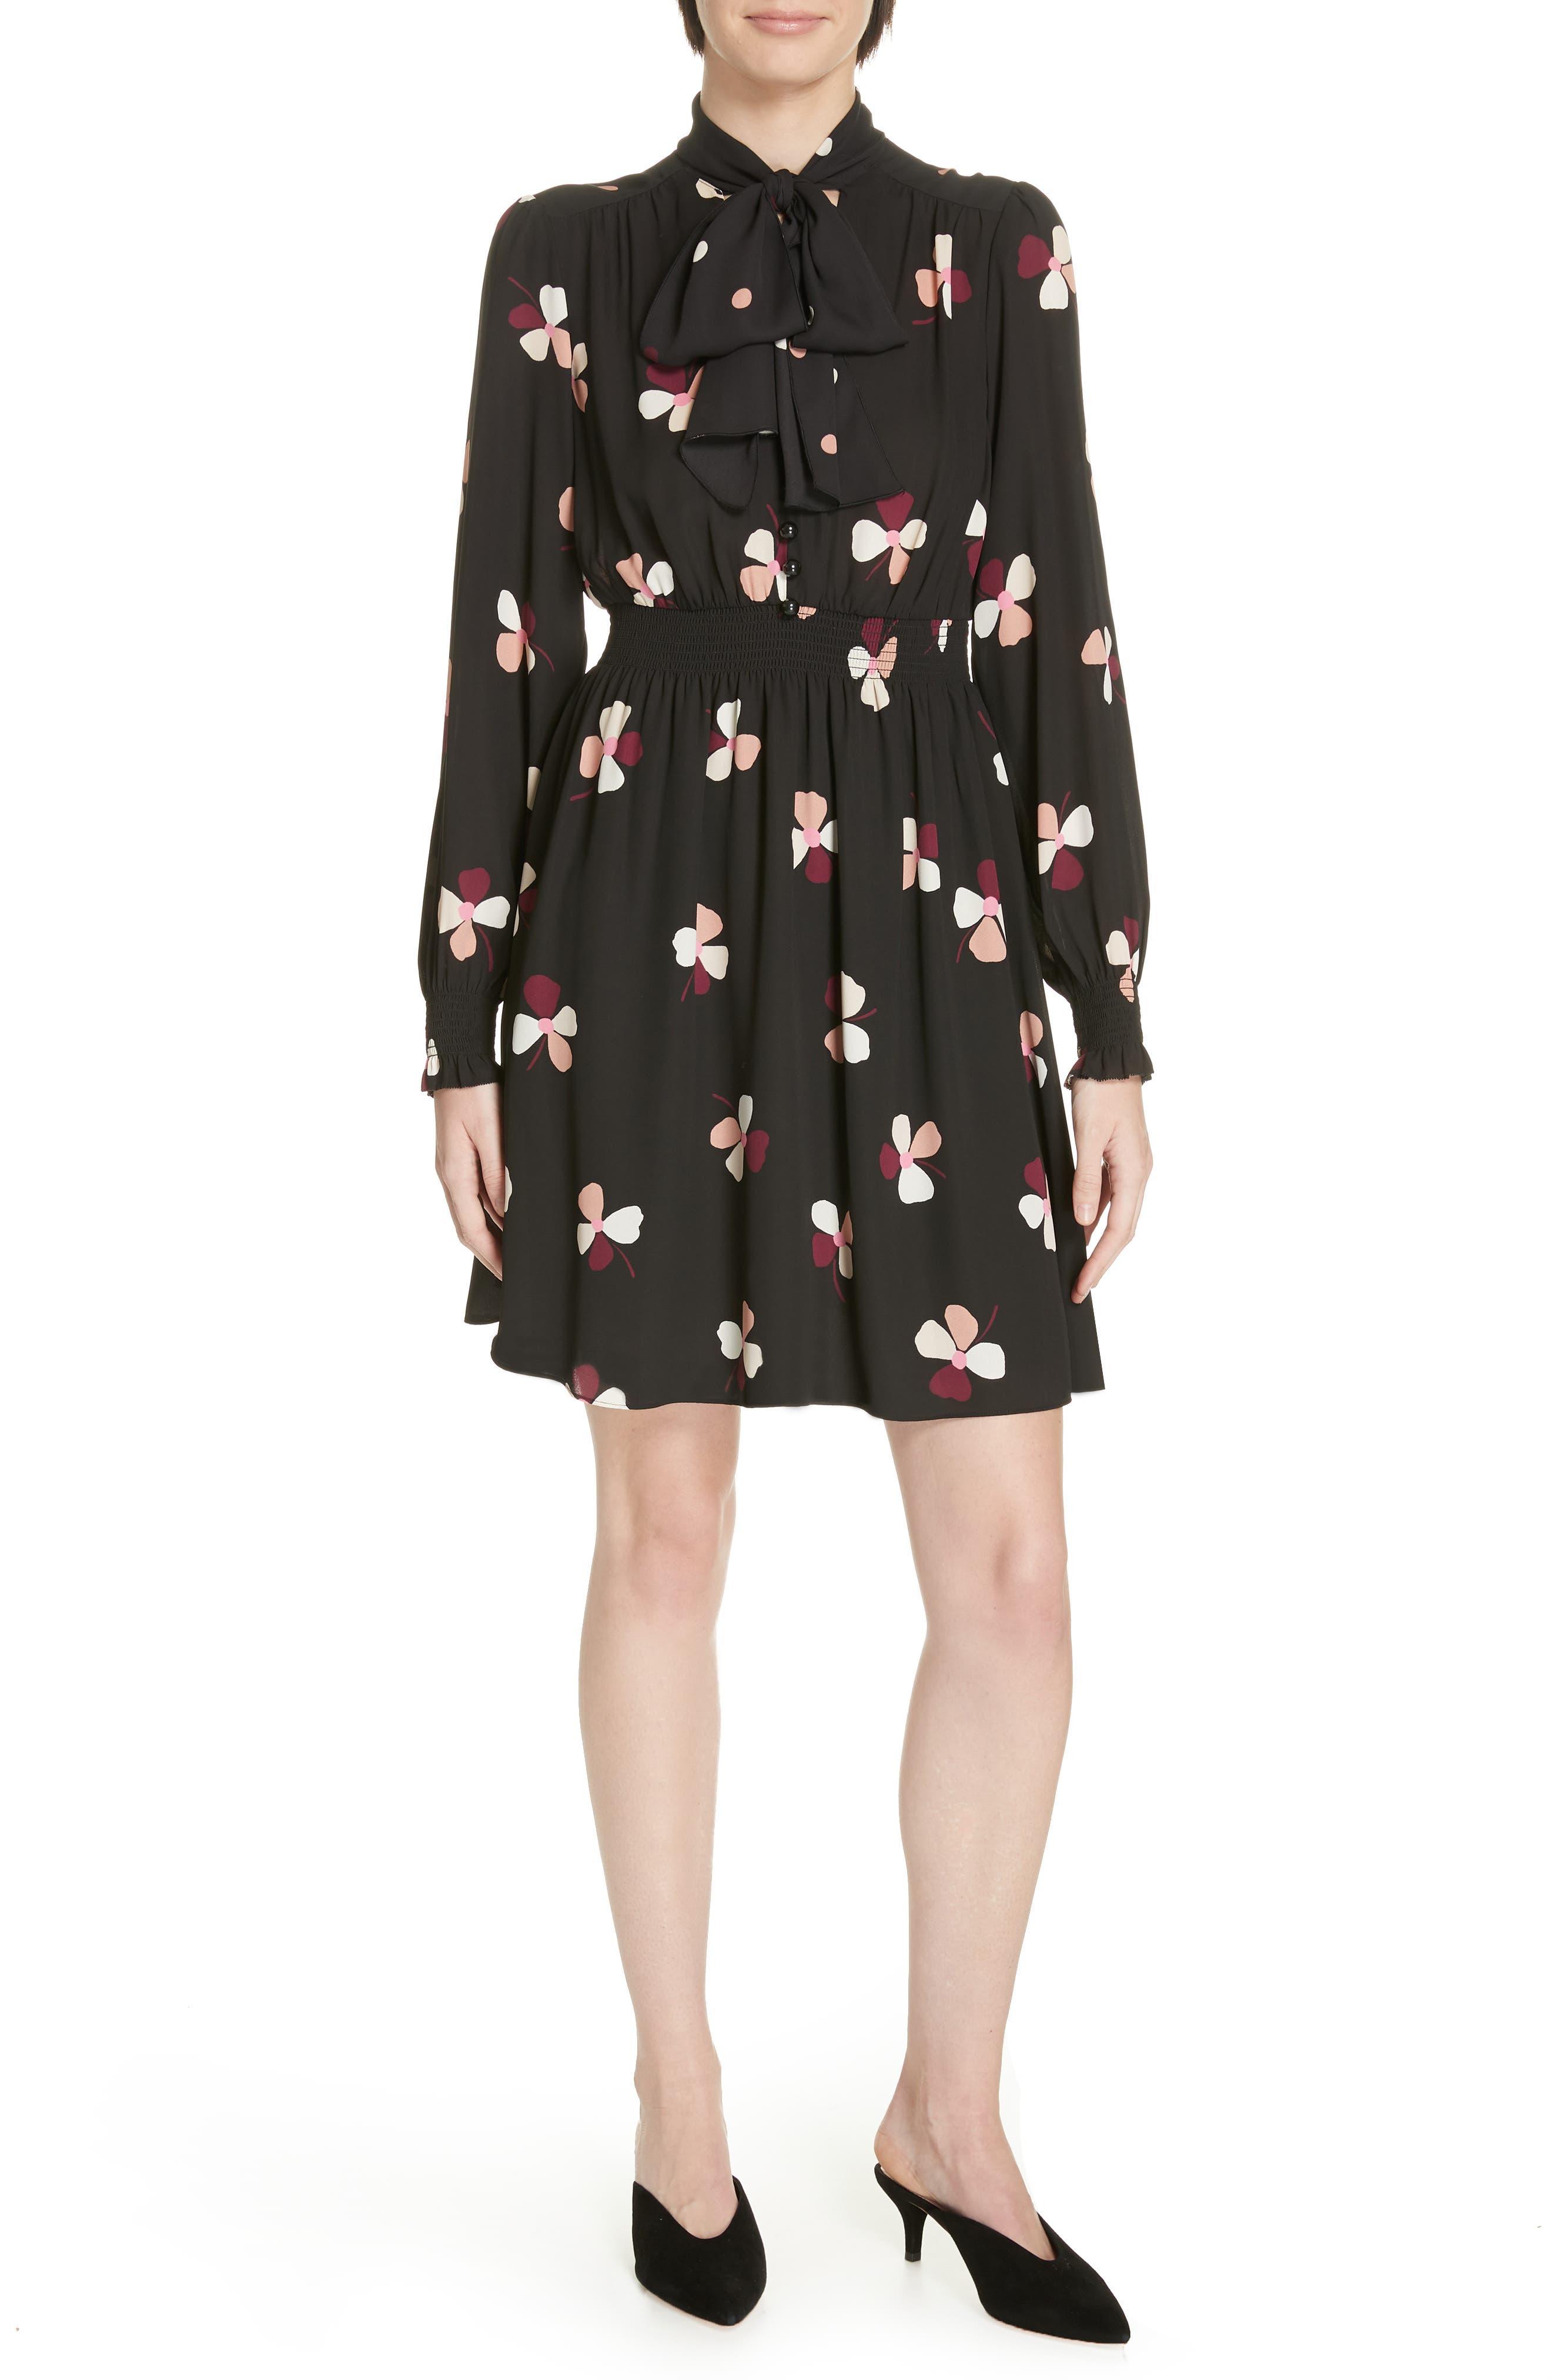 Kate Spade New York Dusk Buds Print Tie Neck Dress, Black